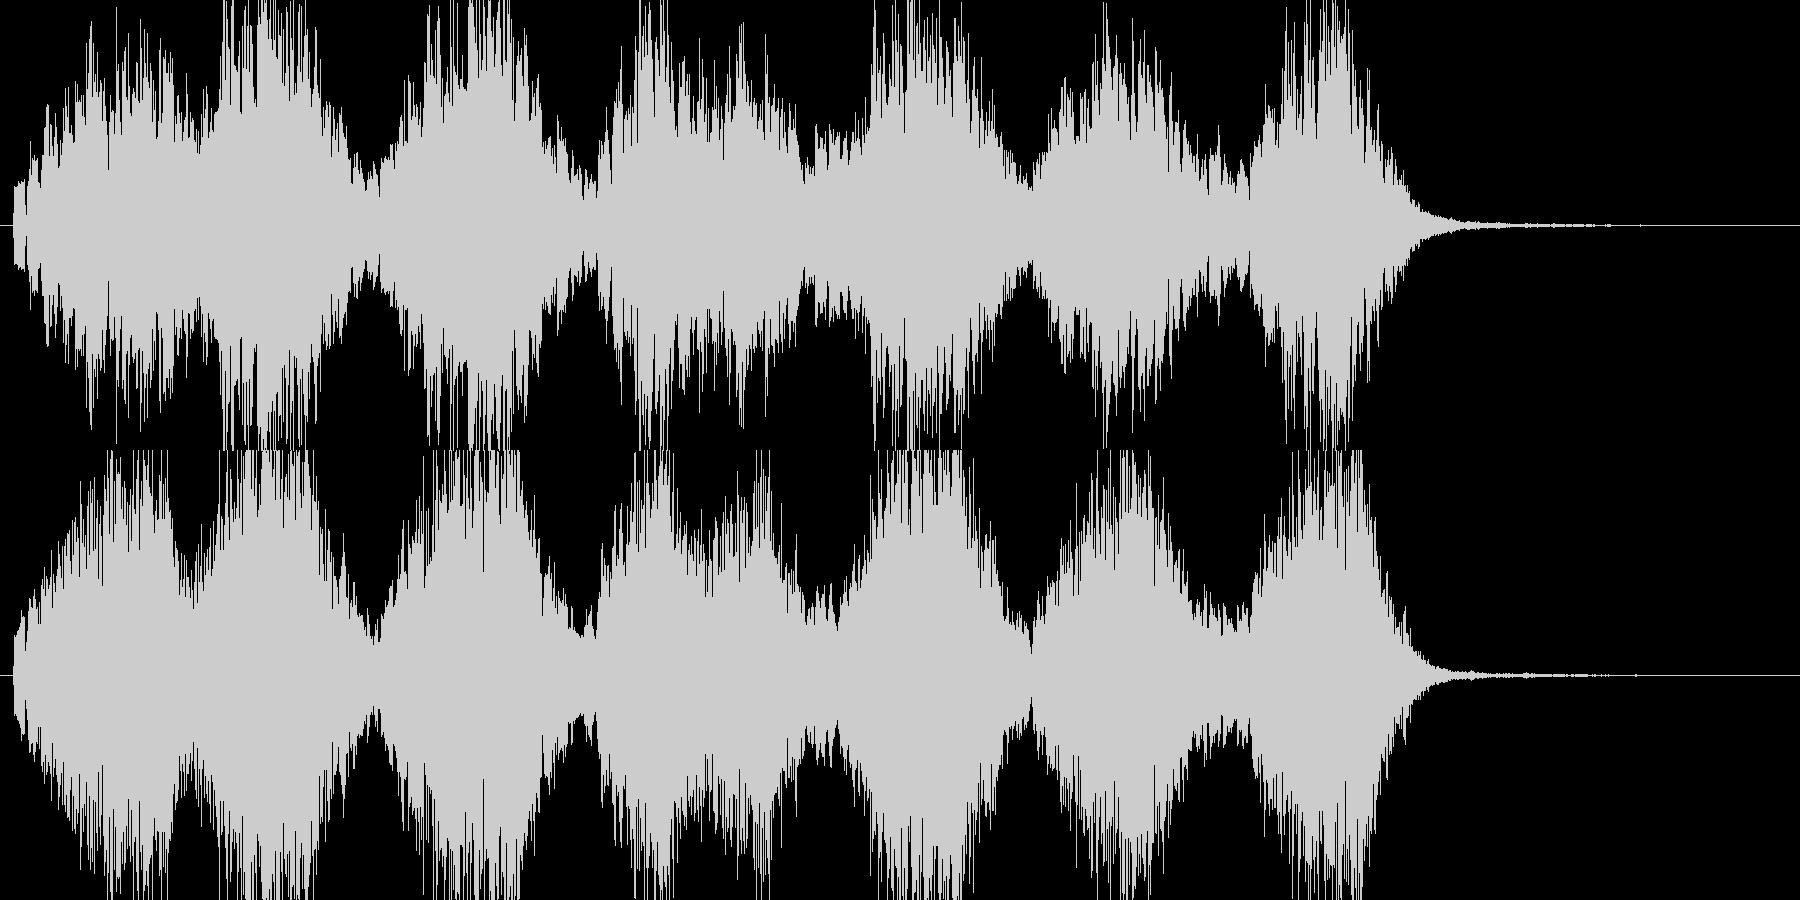 no.1 「科学」「闇」「暗闇」 B9の未再生の波形